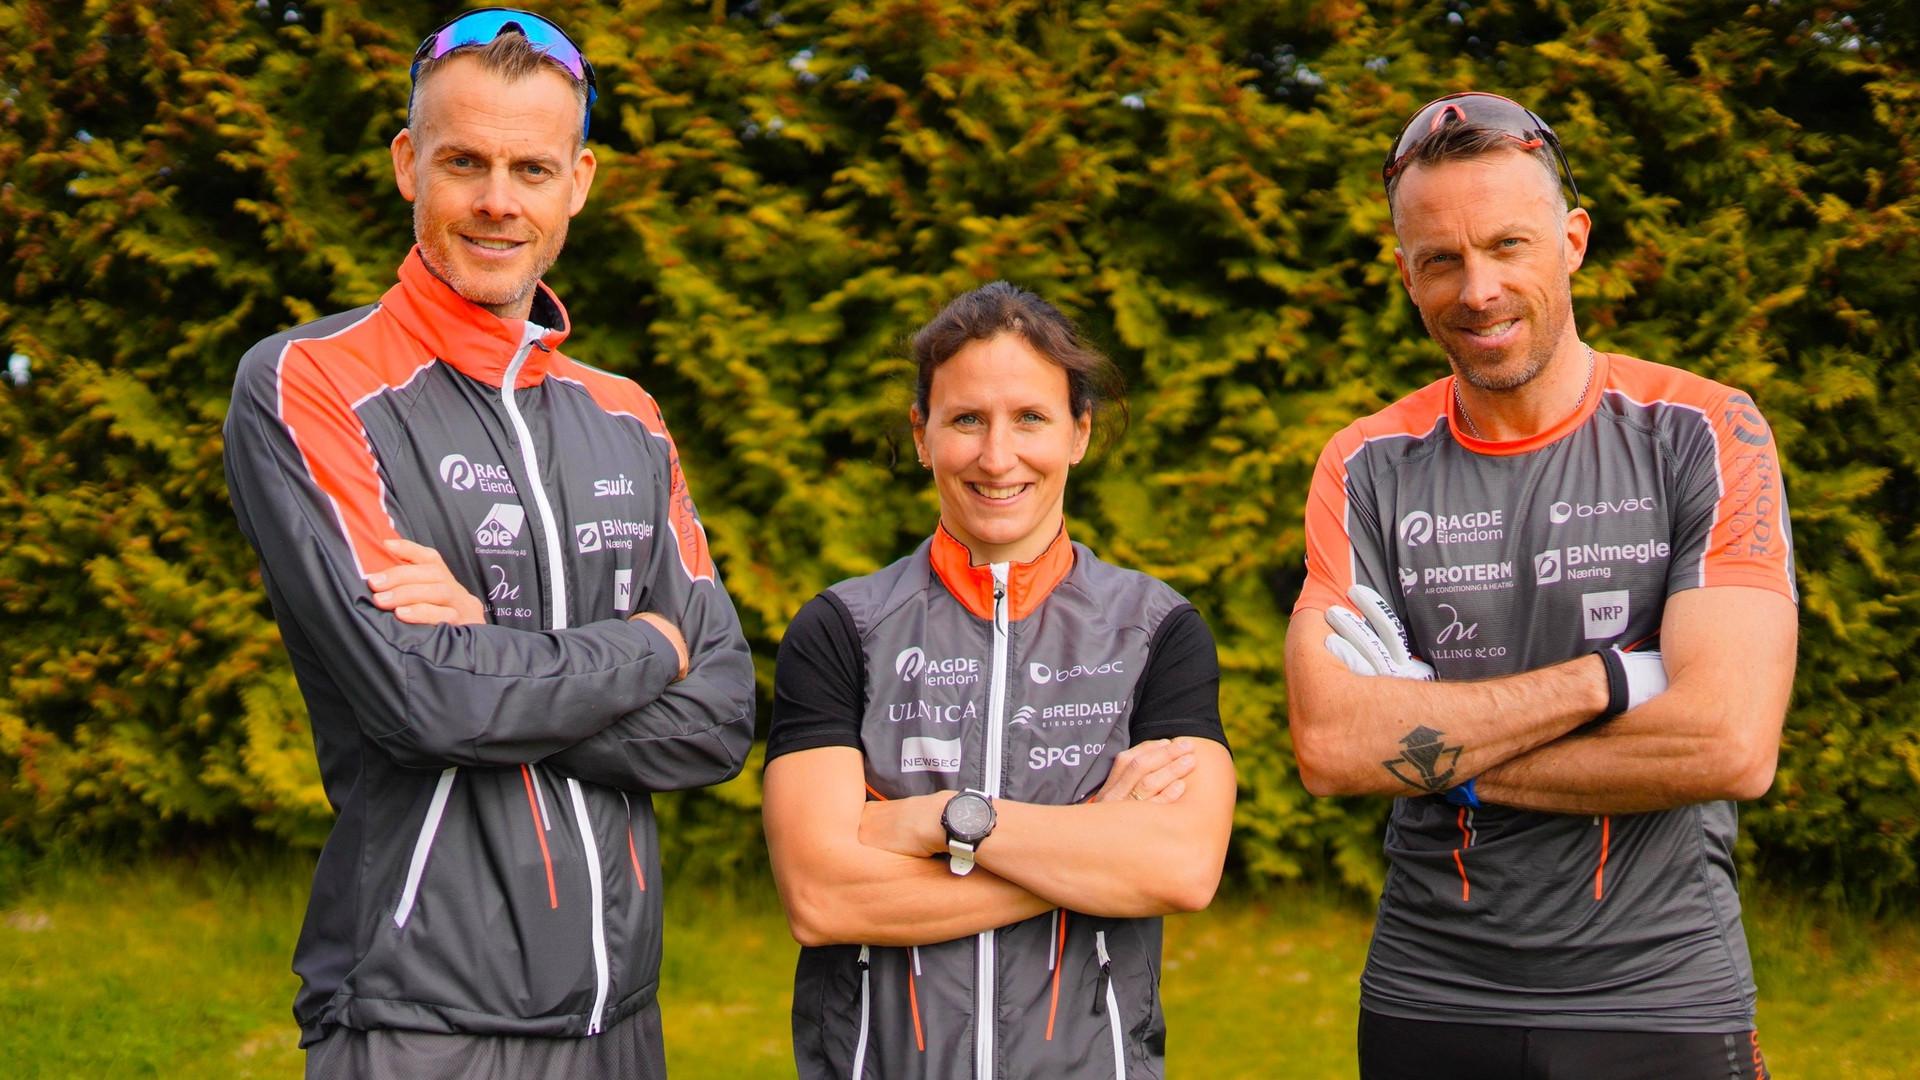 Bjørgen ends retirement to join skiing club Team Ragde Eiendom